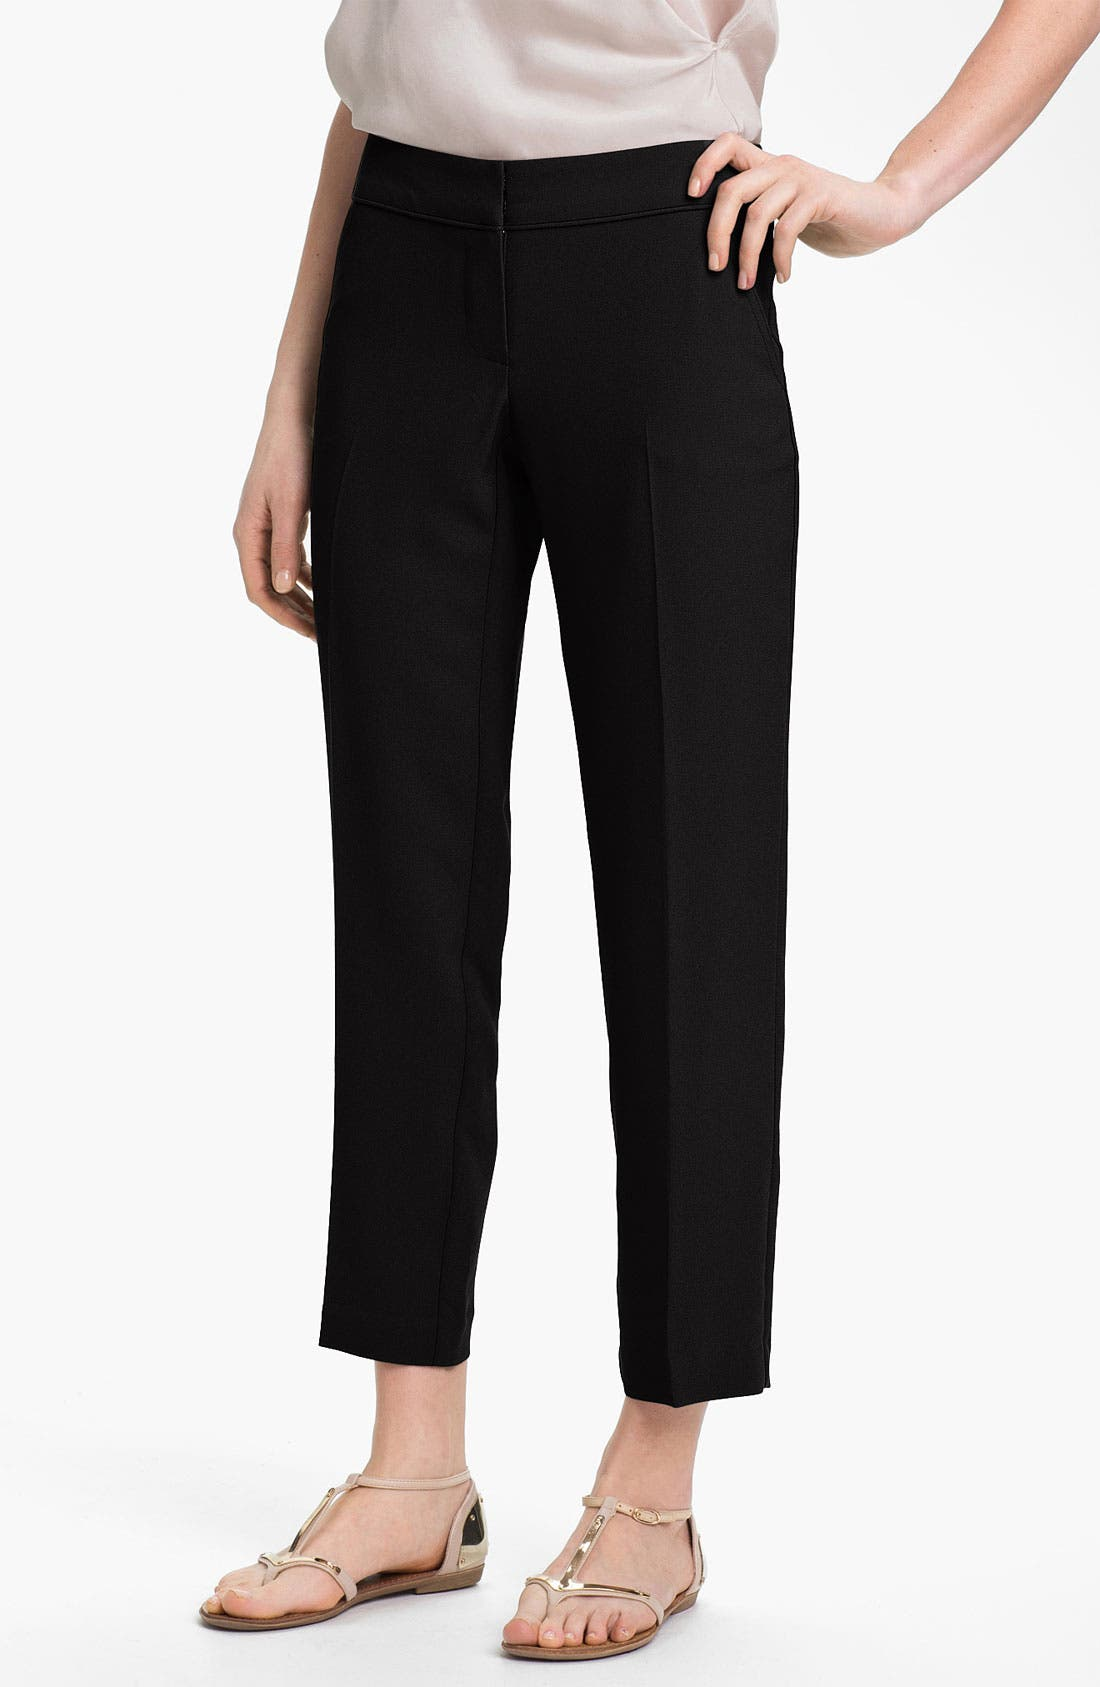 Main Image - Trina Turk 'Kameron' Crop Pants